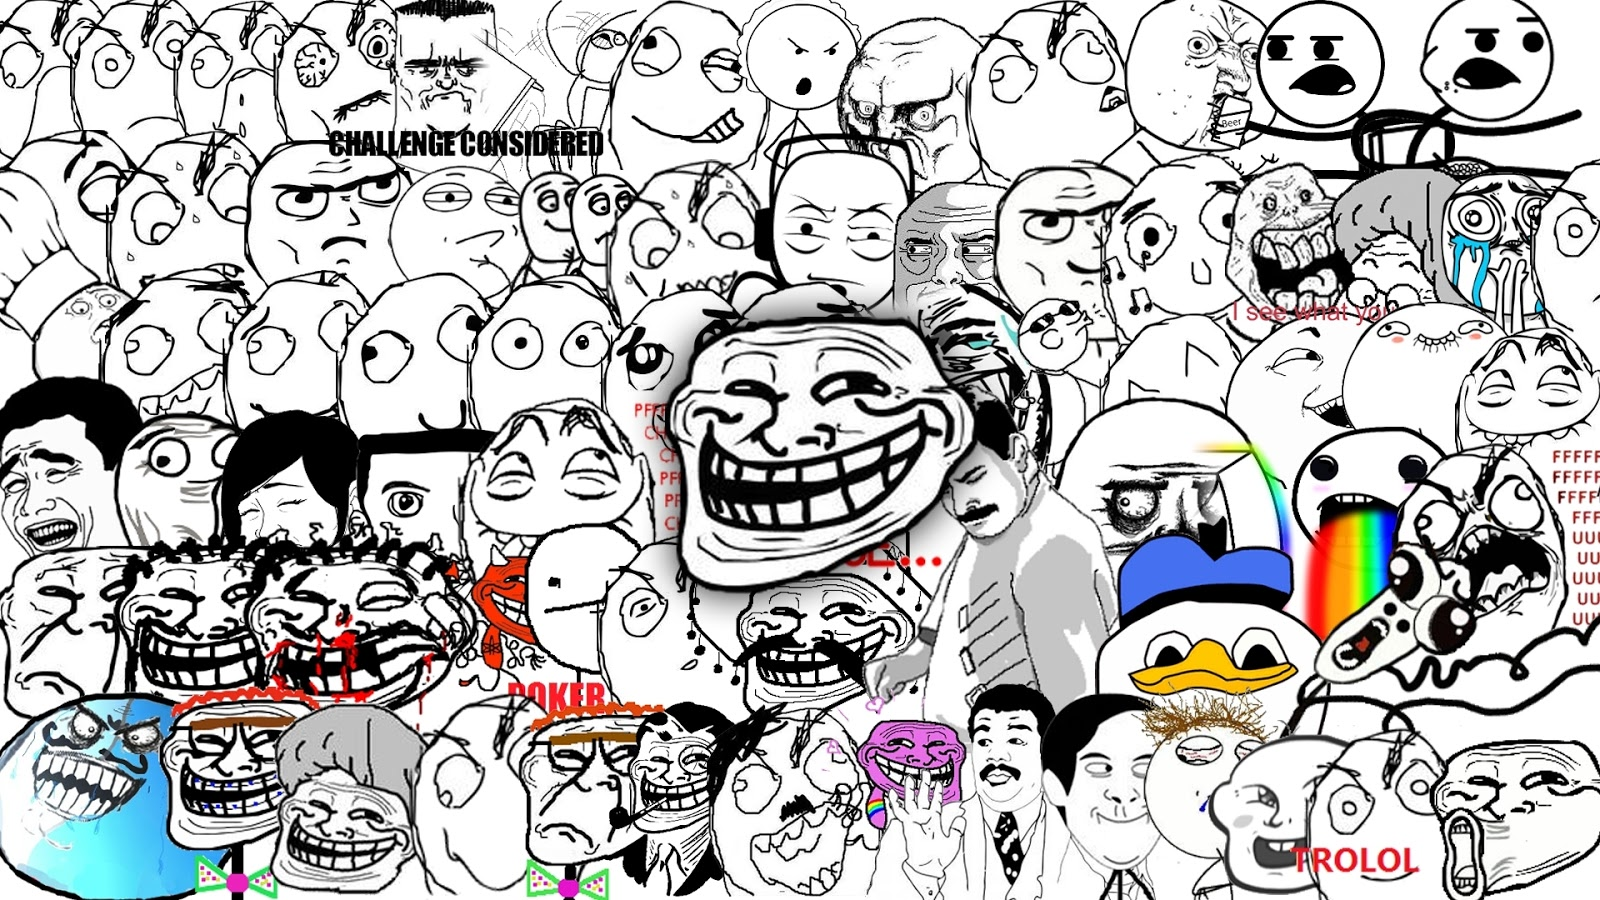 Wallpaper Humor Meme   Papel de Parede RELEASES WALLPAPERS 1600x900